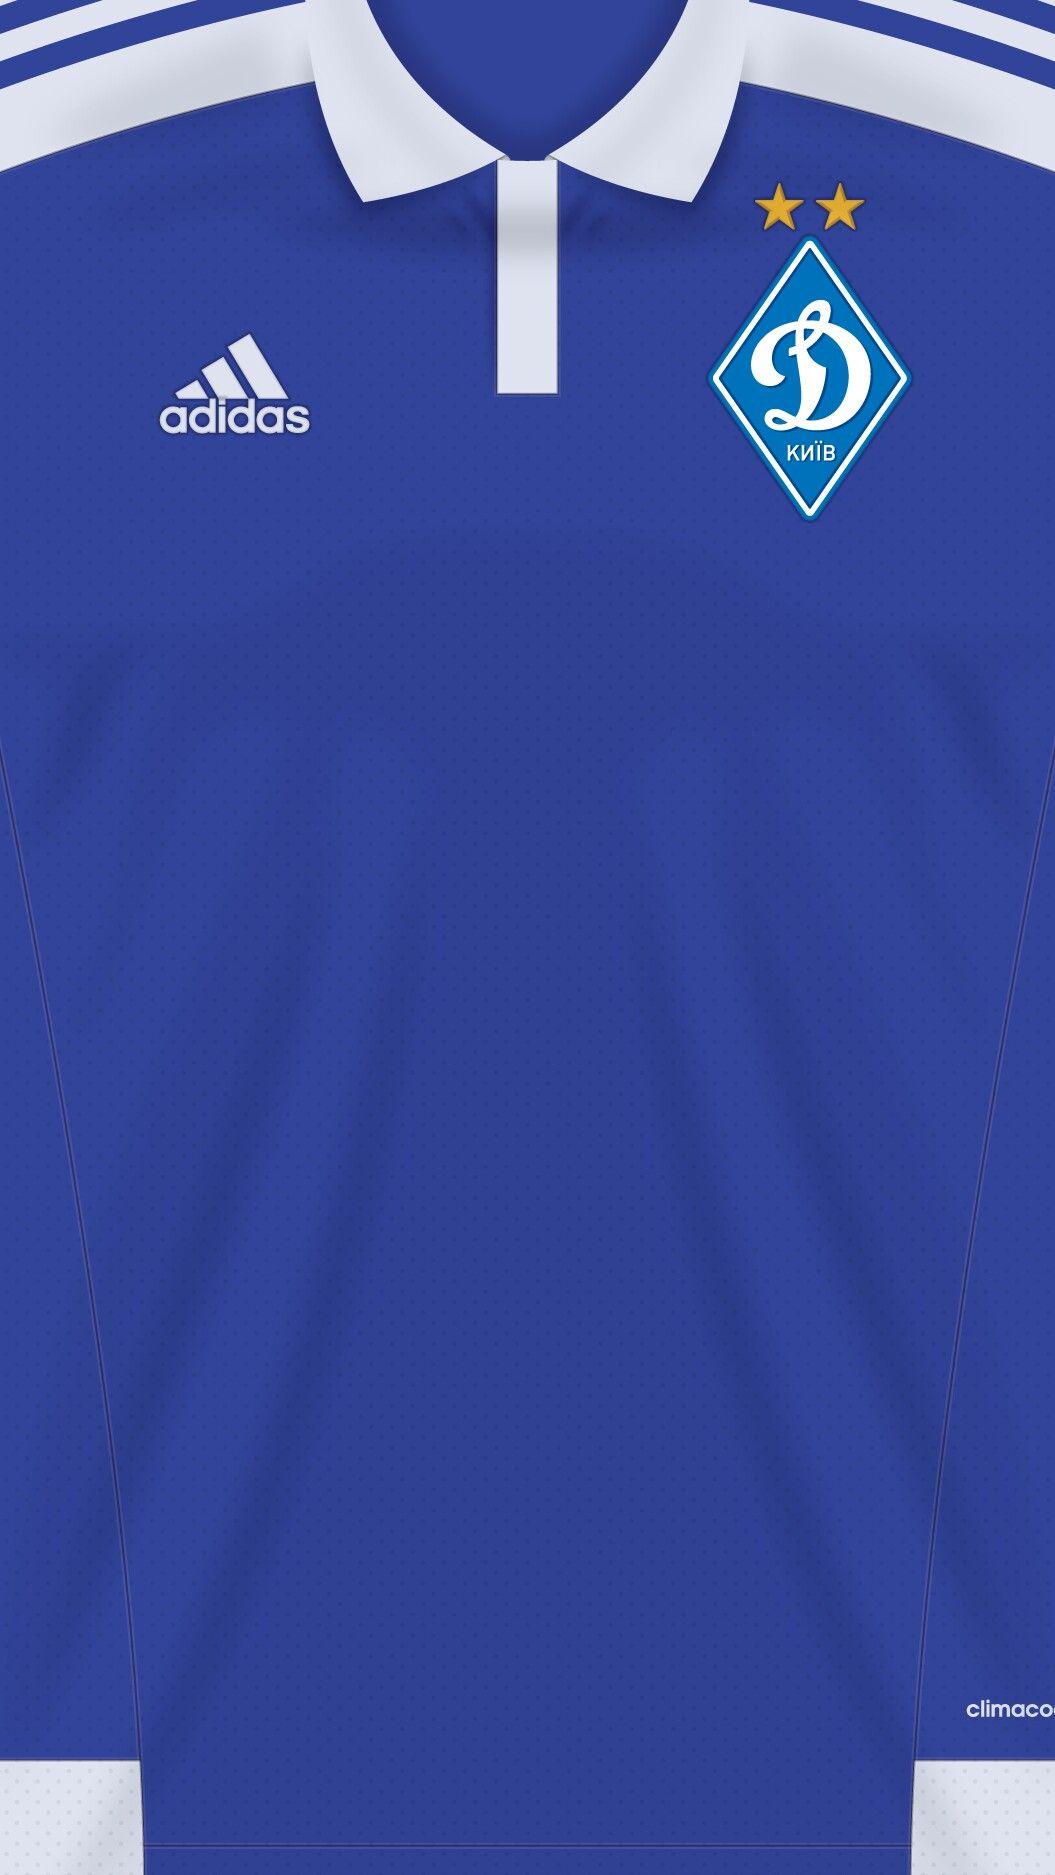 b390bc28da Pin de Murilo Soares em Soccer Kits